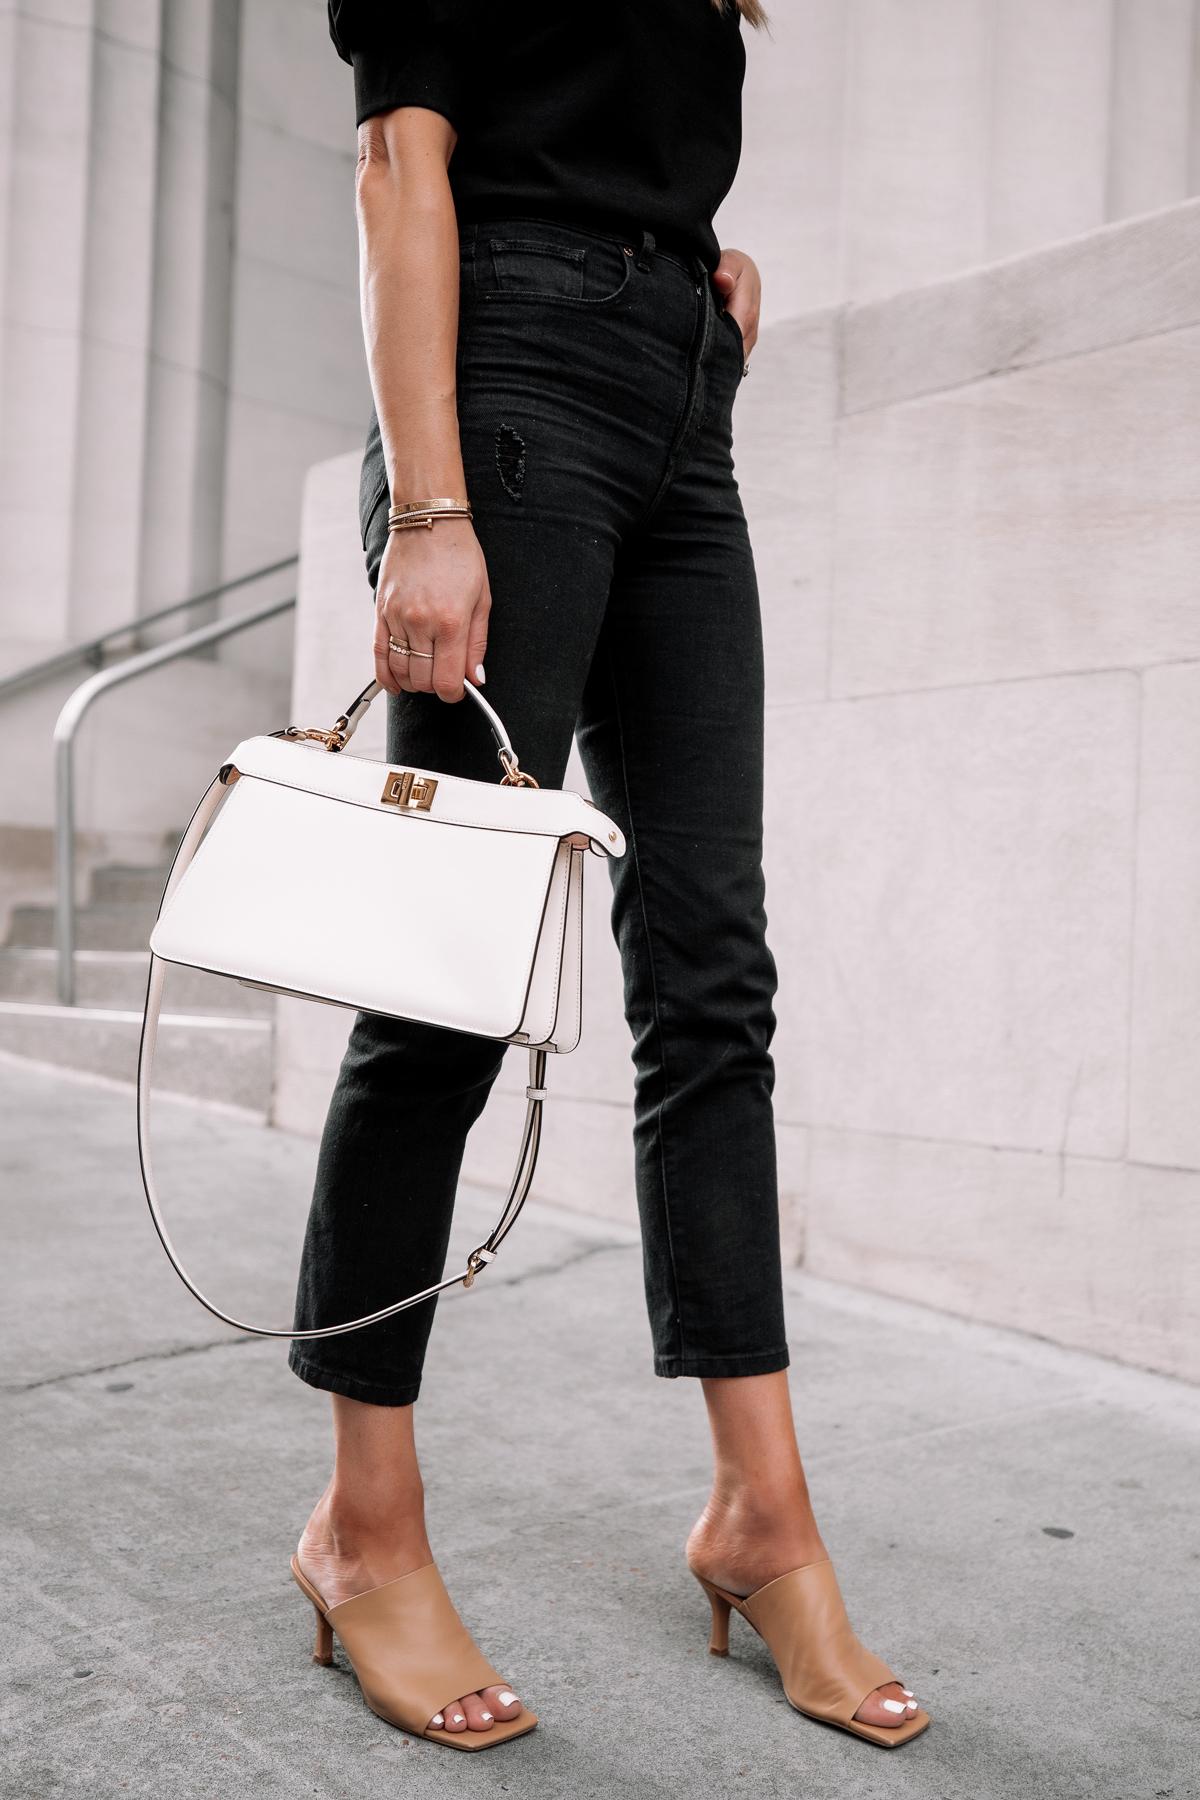 Fashion Jackson Wearing Black Top Black Ripped Jeans Nude Heeld Sandals Fendi White Peekaboo Handbag 1